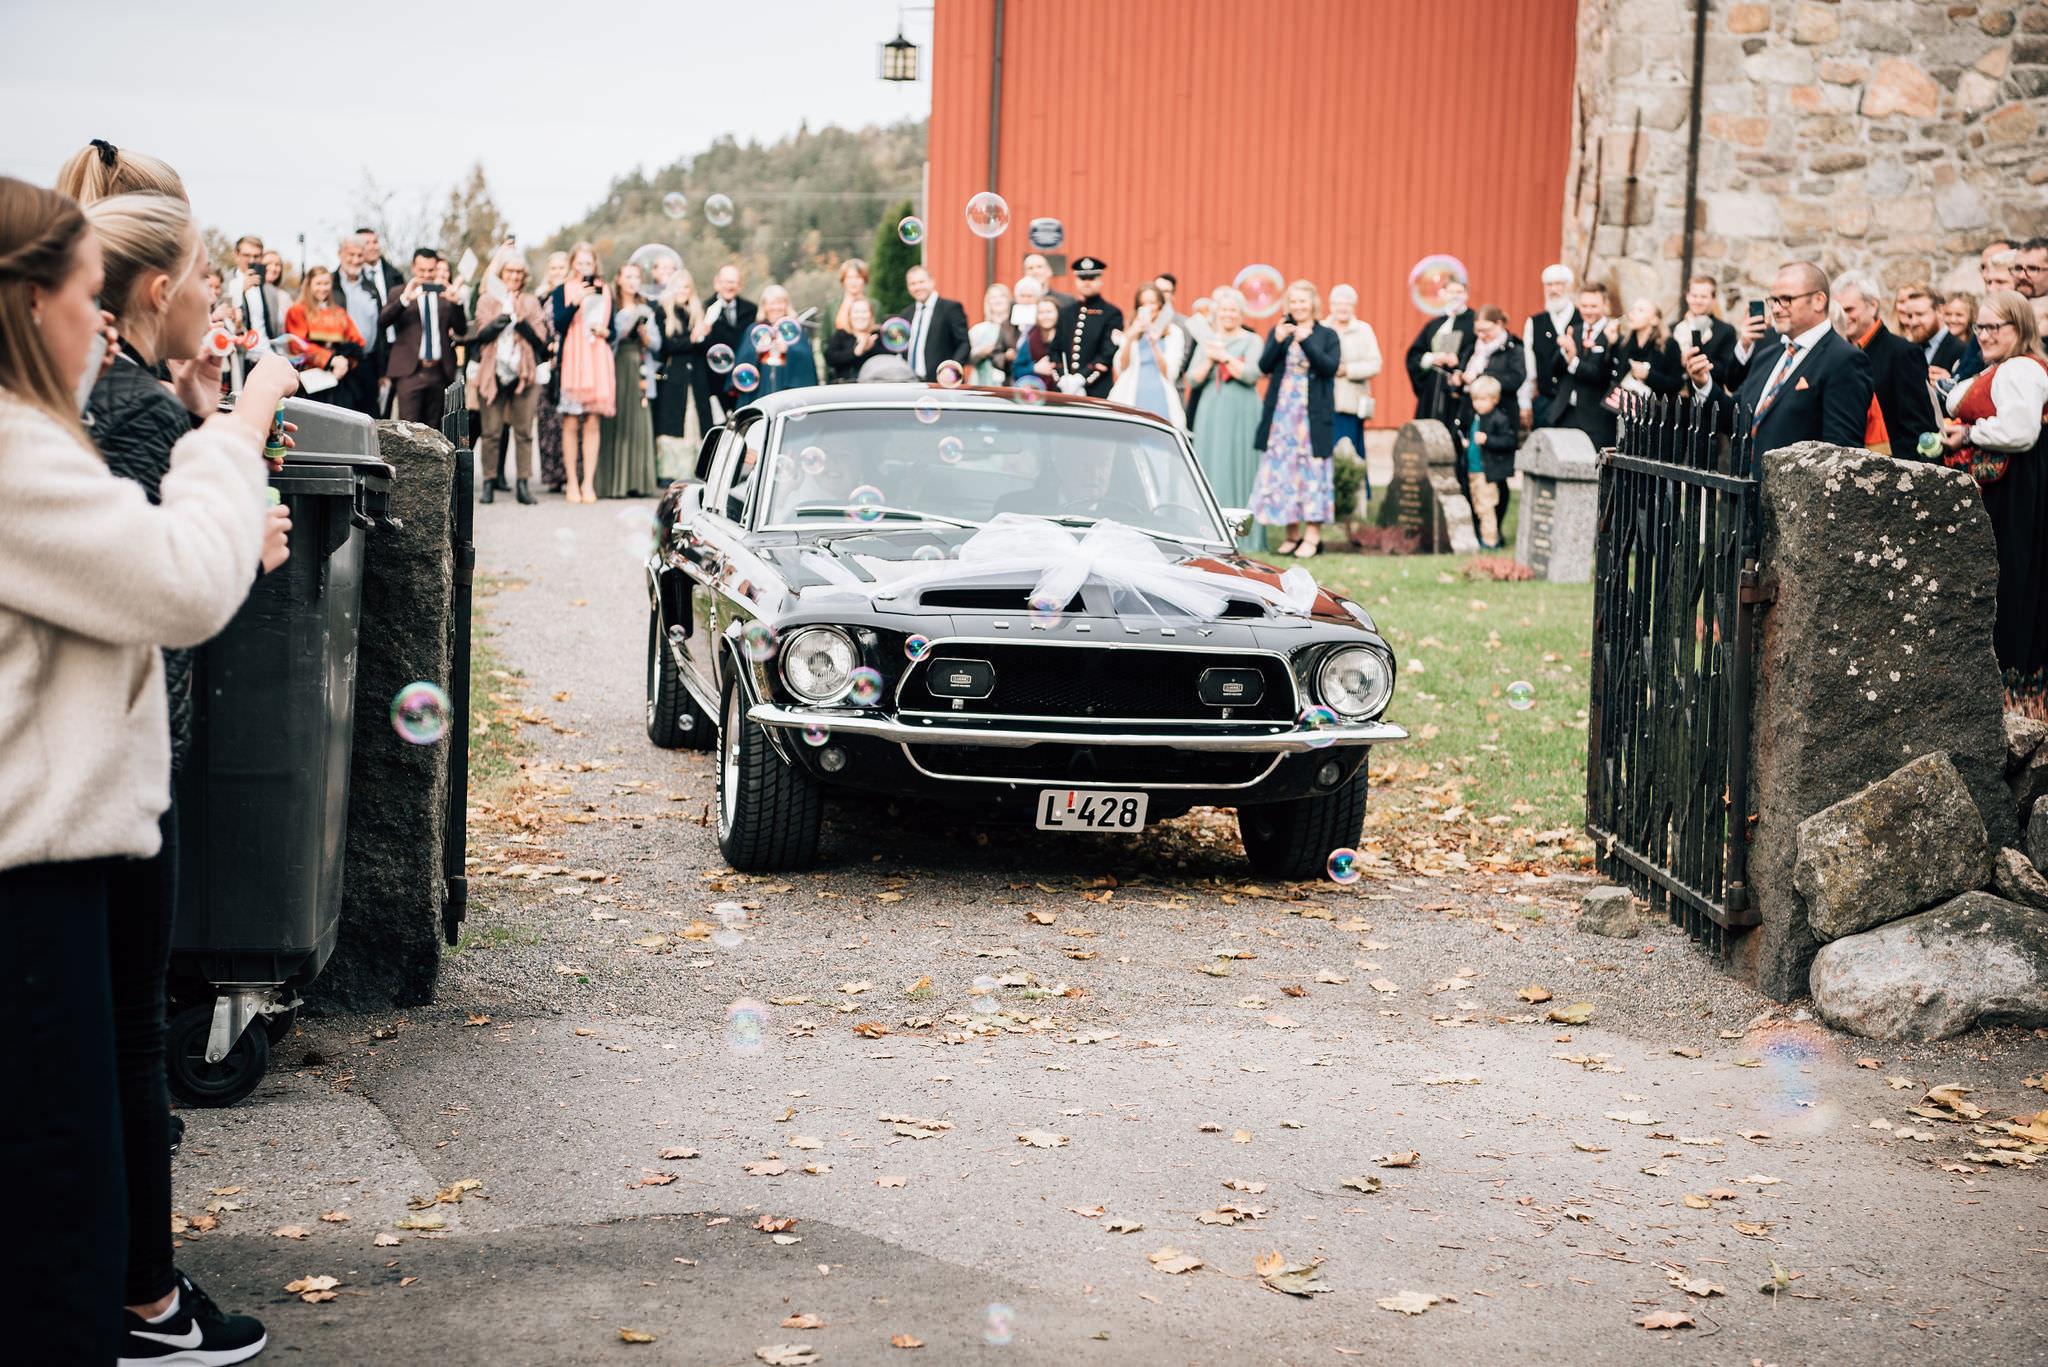 750_0010_fotografering_larvik_bryllup_aspargesgarden_.jpg